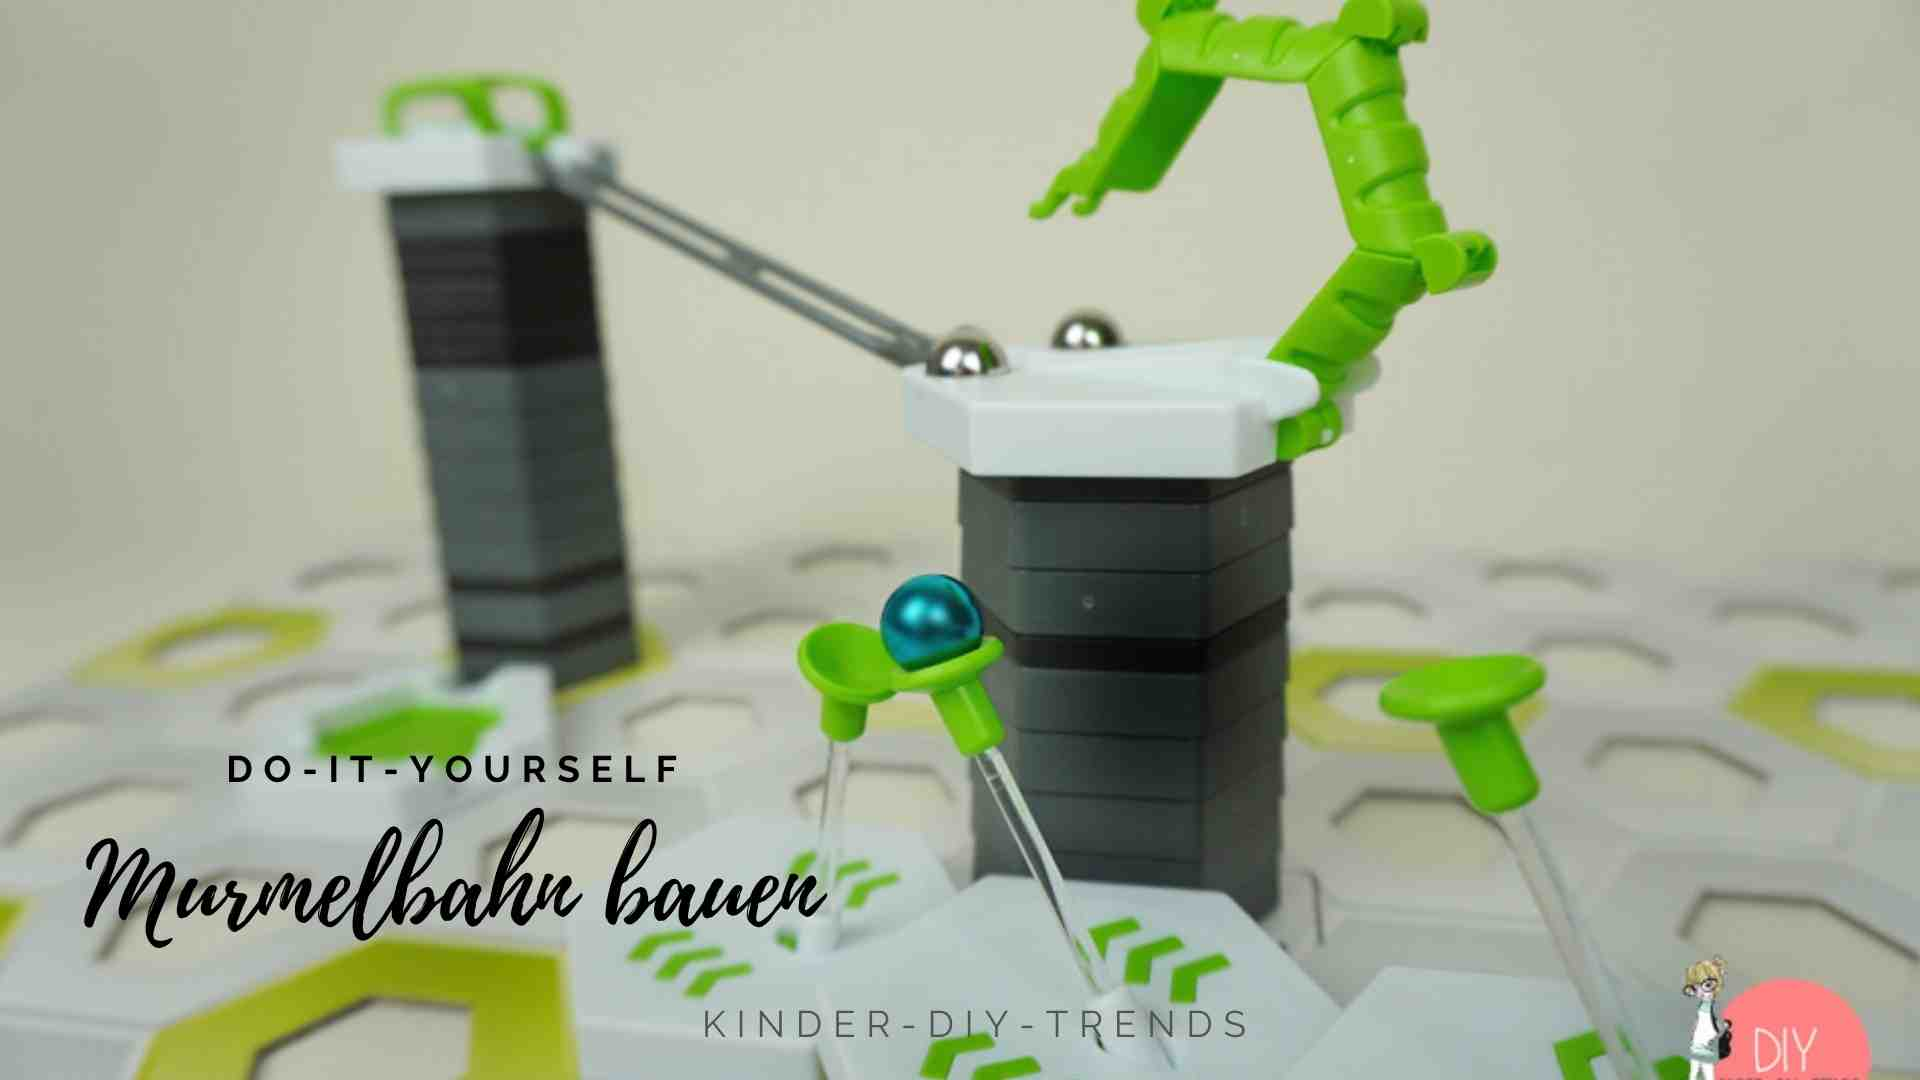 Kreative Geschenkideen für Kinder: Gravitrax Murmelbahn 3D aufbauen